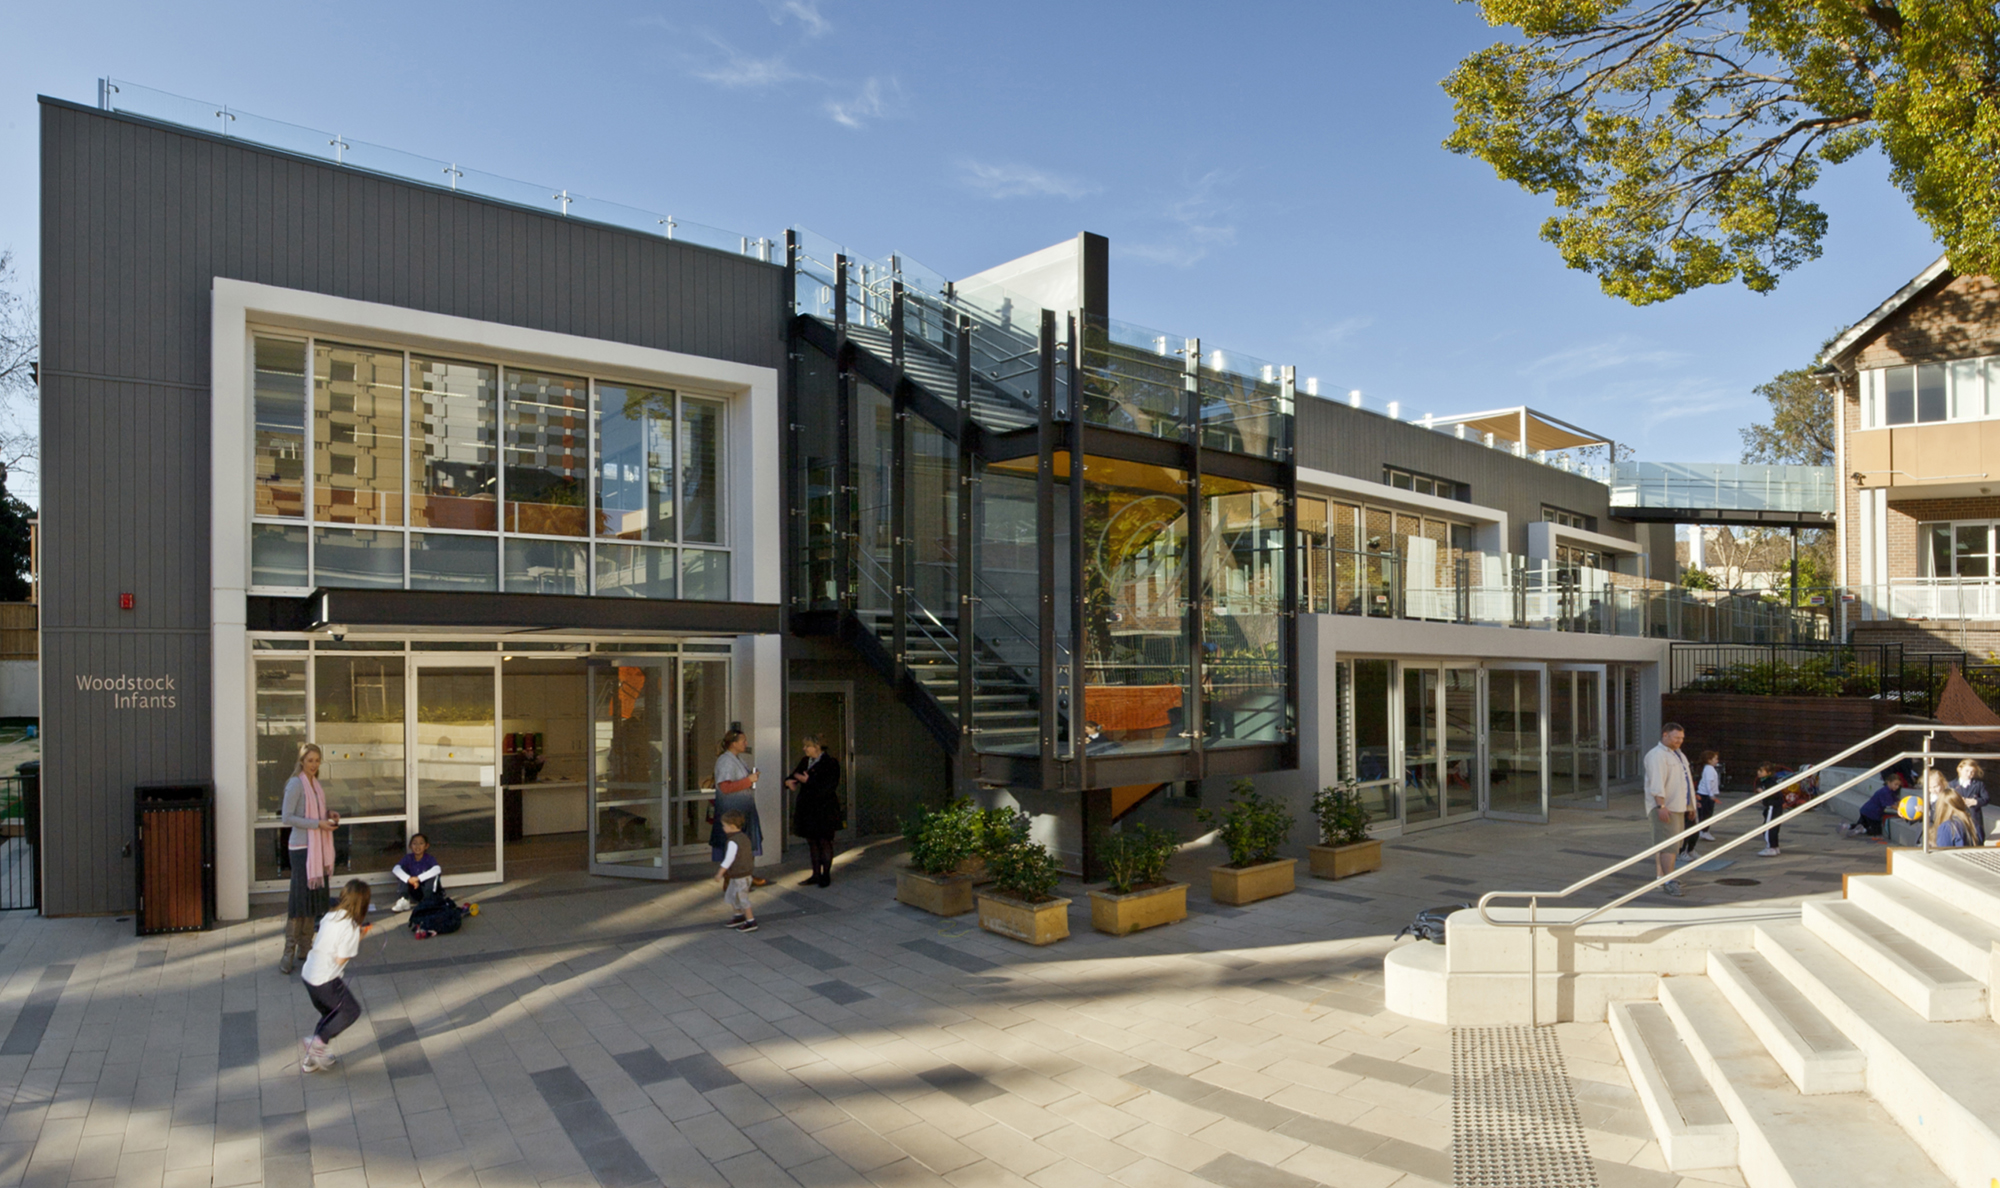 Wenona Woodstock Infants School Entry Courtyard and Architectural Design – Gardner Wetherill GW 3